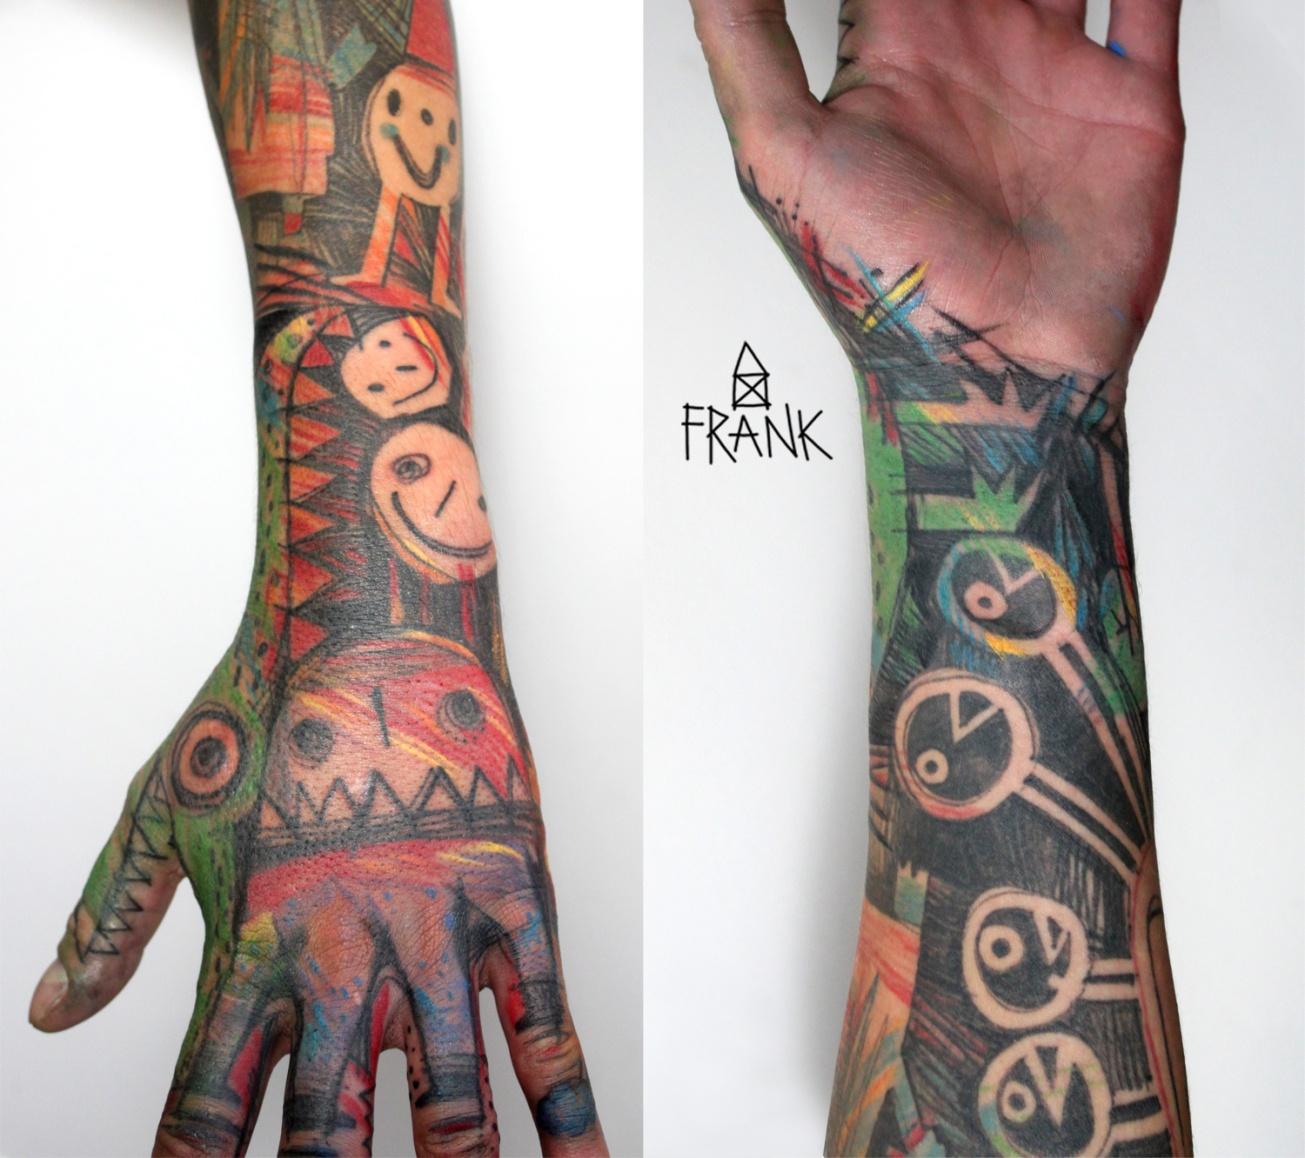 Miriam_Frank_Tattoo_child_eule_graphic